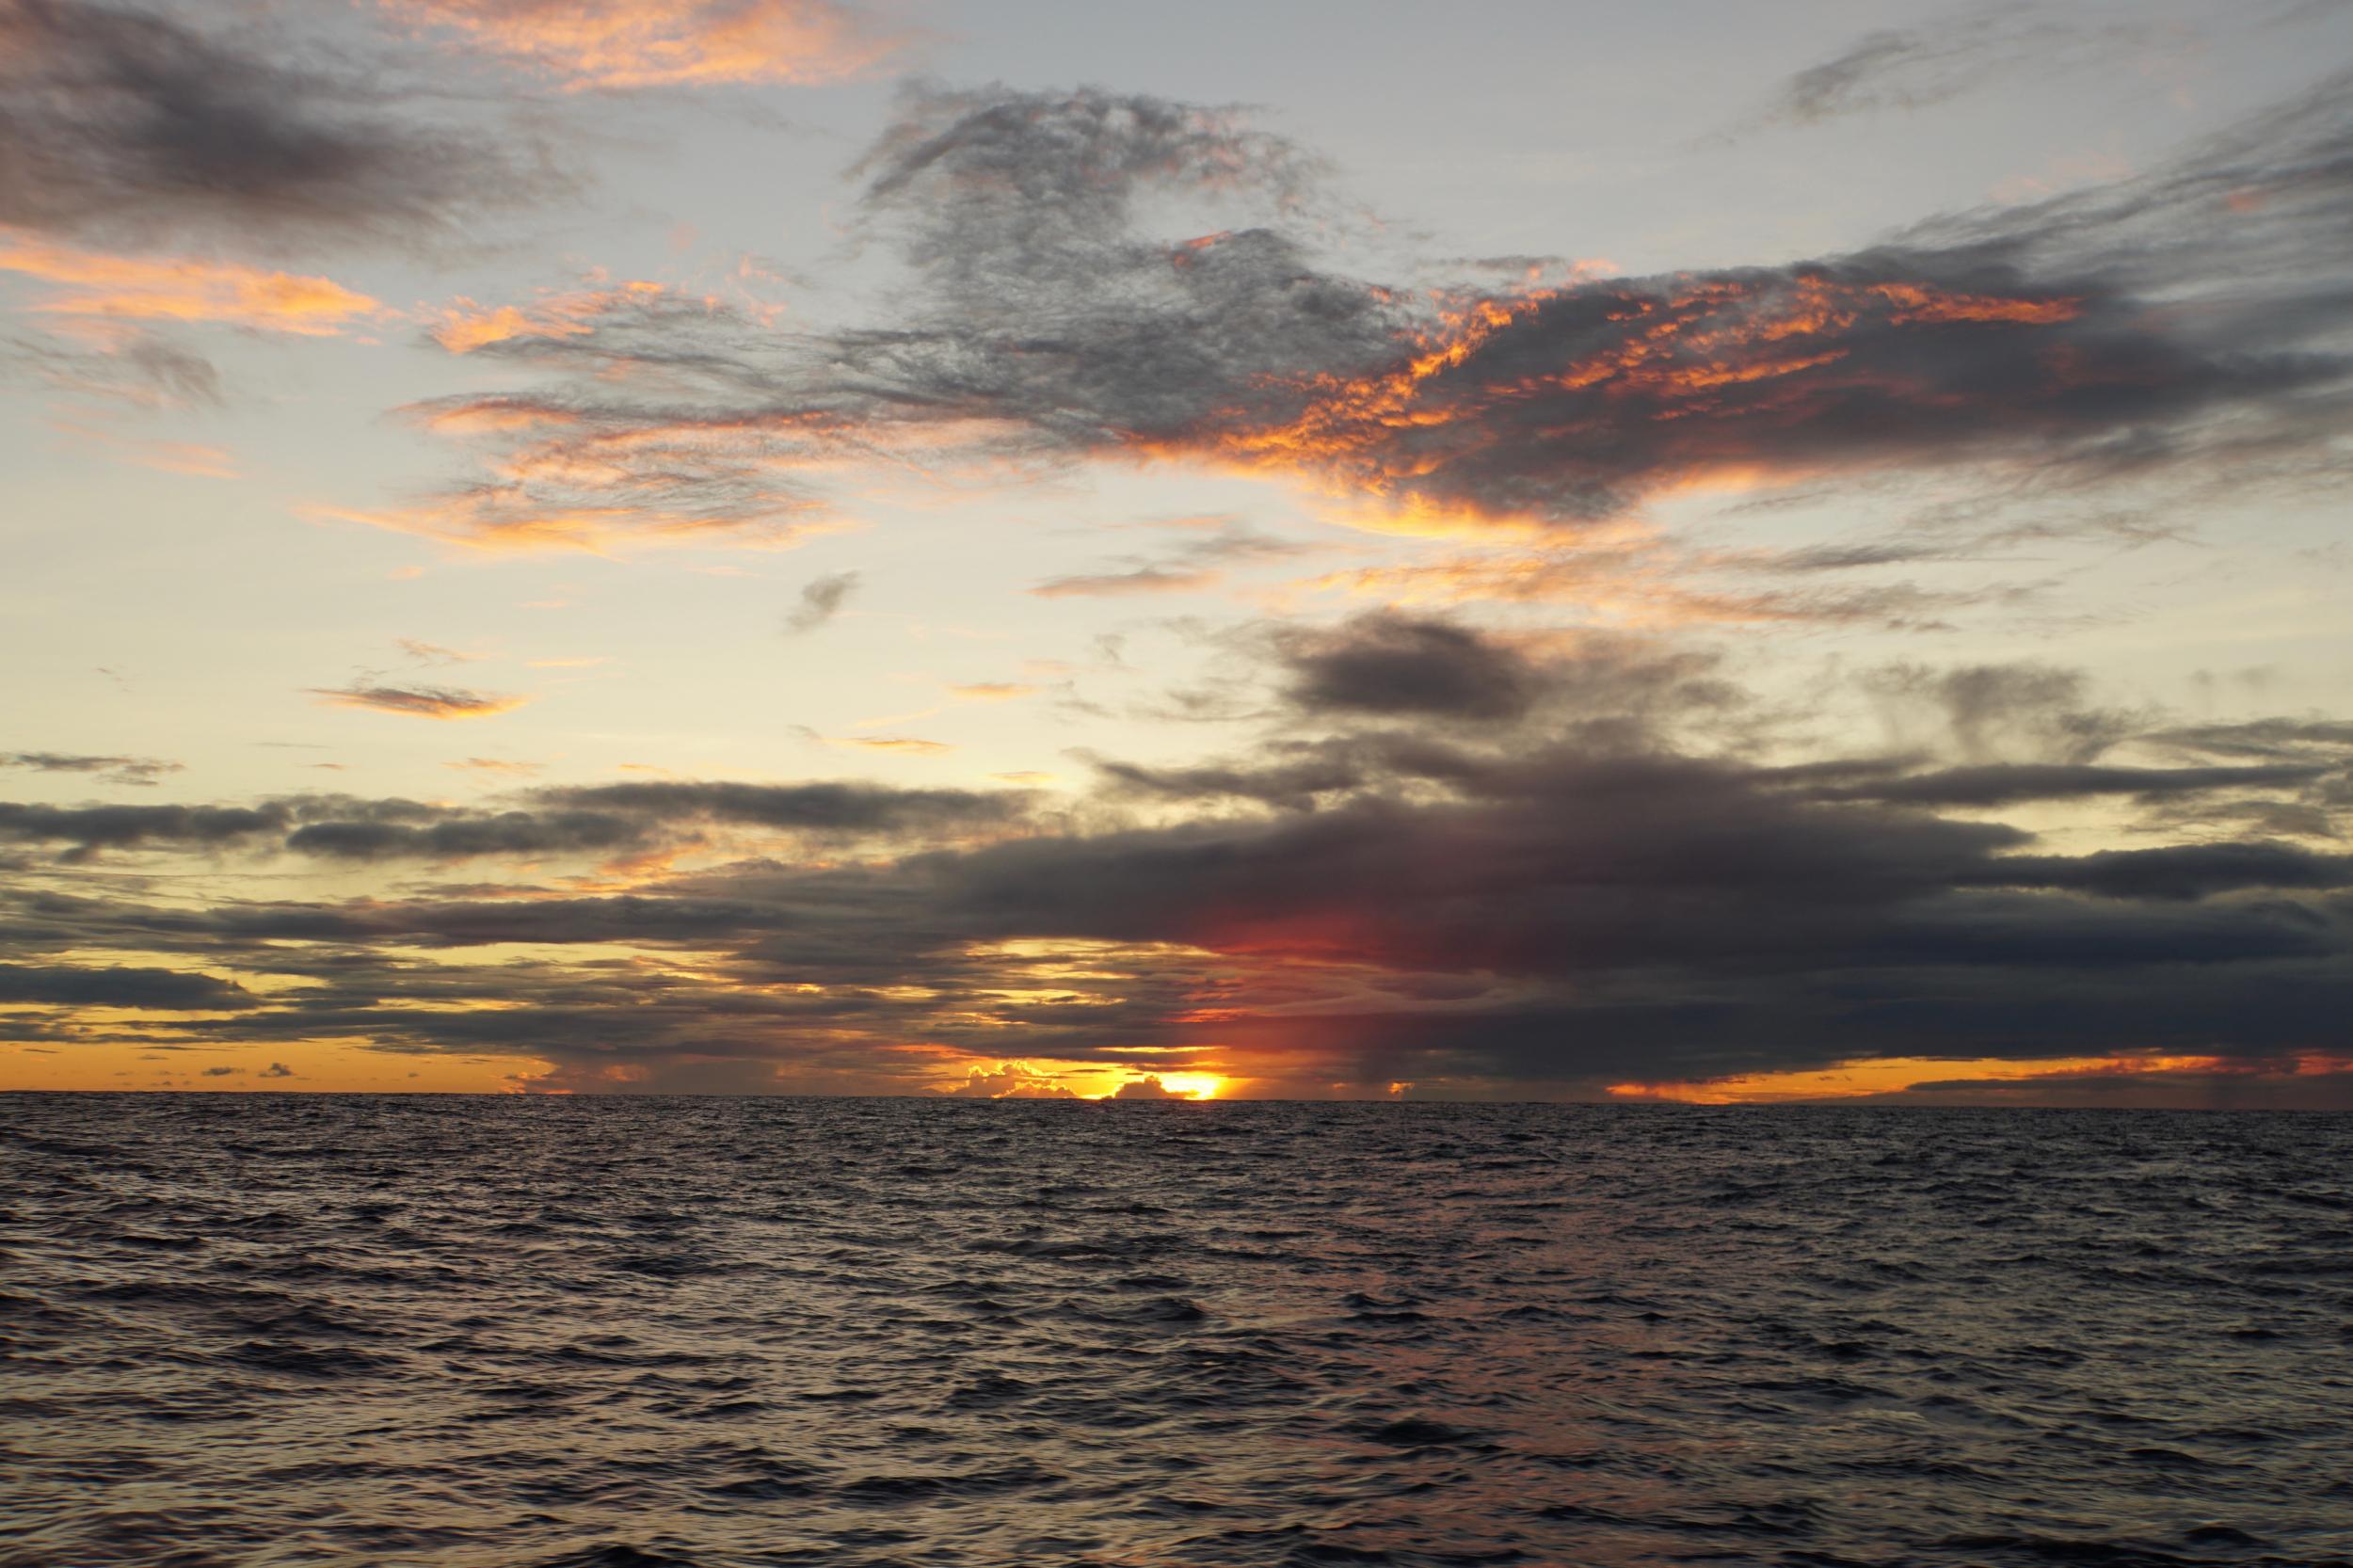 17. Sunsets